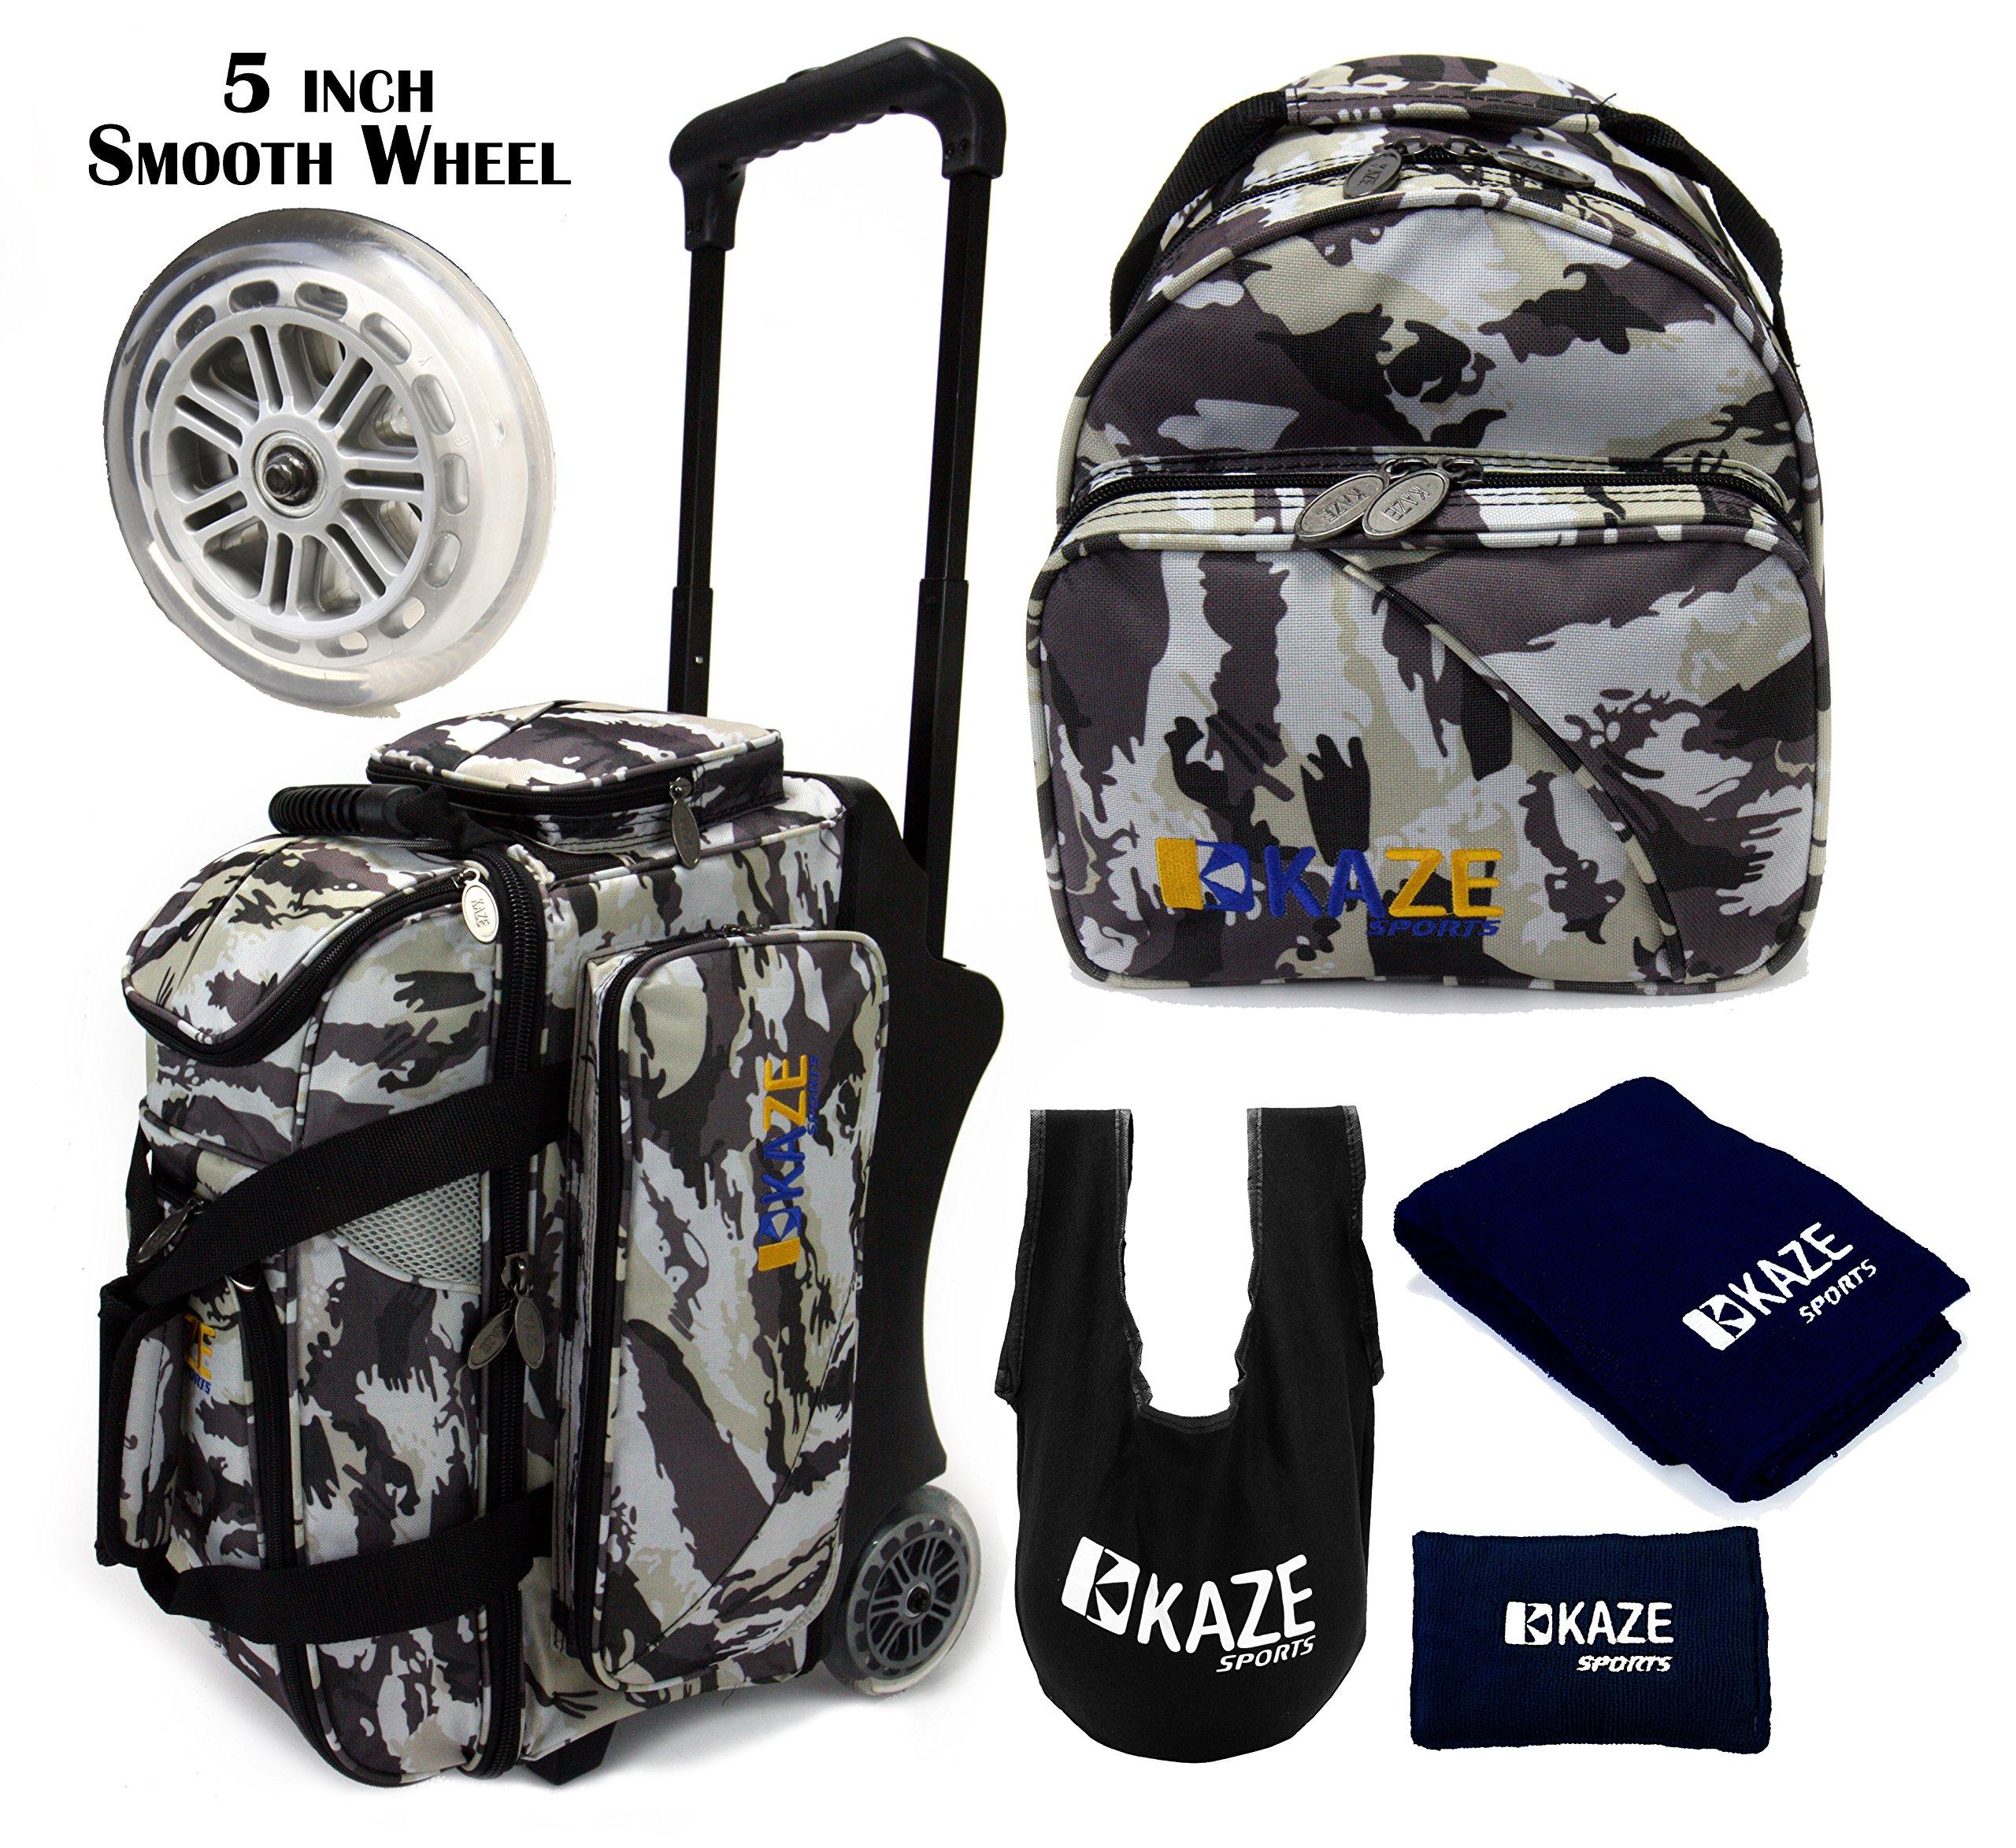 KAZE SPORTS 2 Ball Bowling Roller (White Camo Package) by KAZE SPORTS